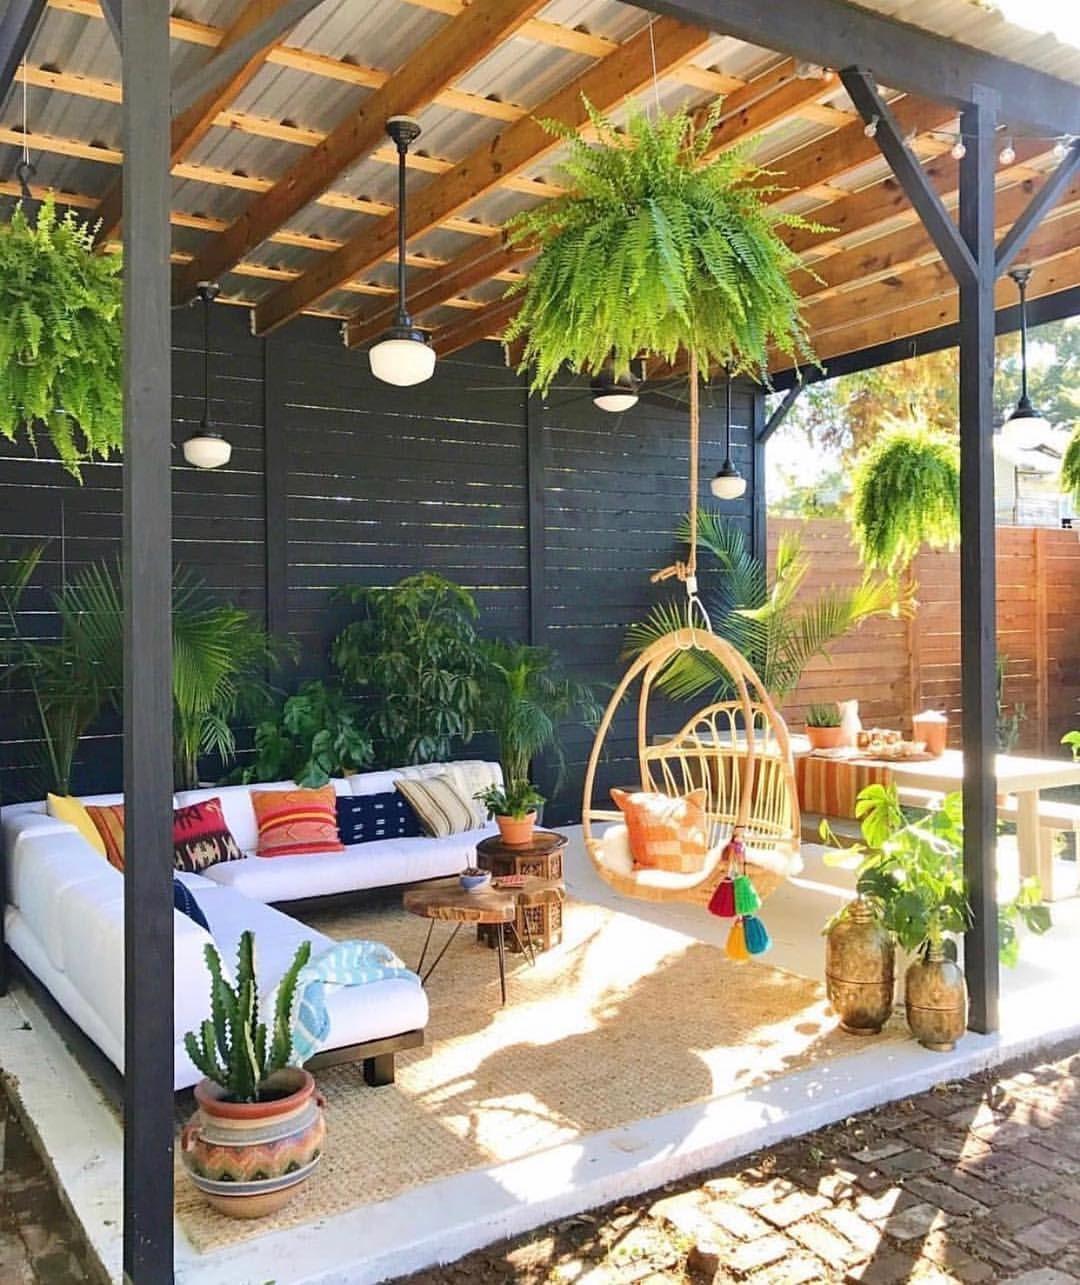 Pin Pa Backyard Oasis Backyard oasis ideas this old house